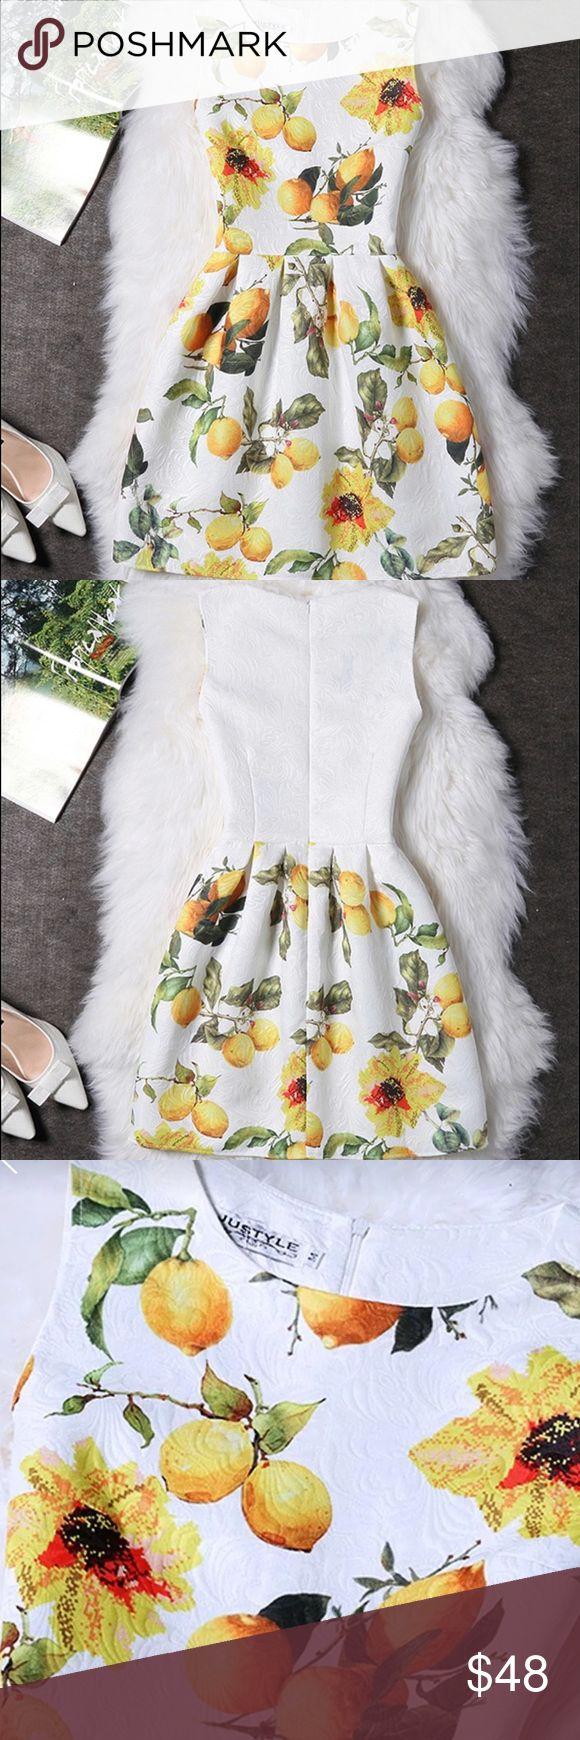 "Vintage, rockabilly style summer dress 🍋🌻 Floral and lemon print , A line , O neck ,Polyester, Nylon, Linen , Jacquard. Approx bust : 36.2"", shoulder 14.6"", waist 29.1 , length 32.7"" justyle Dresses"